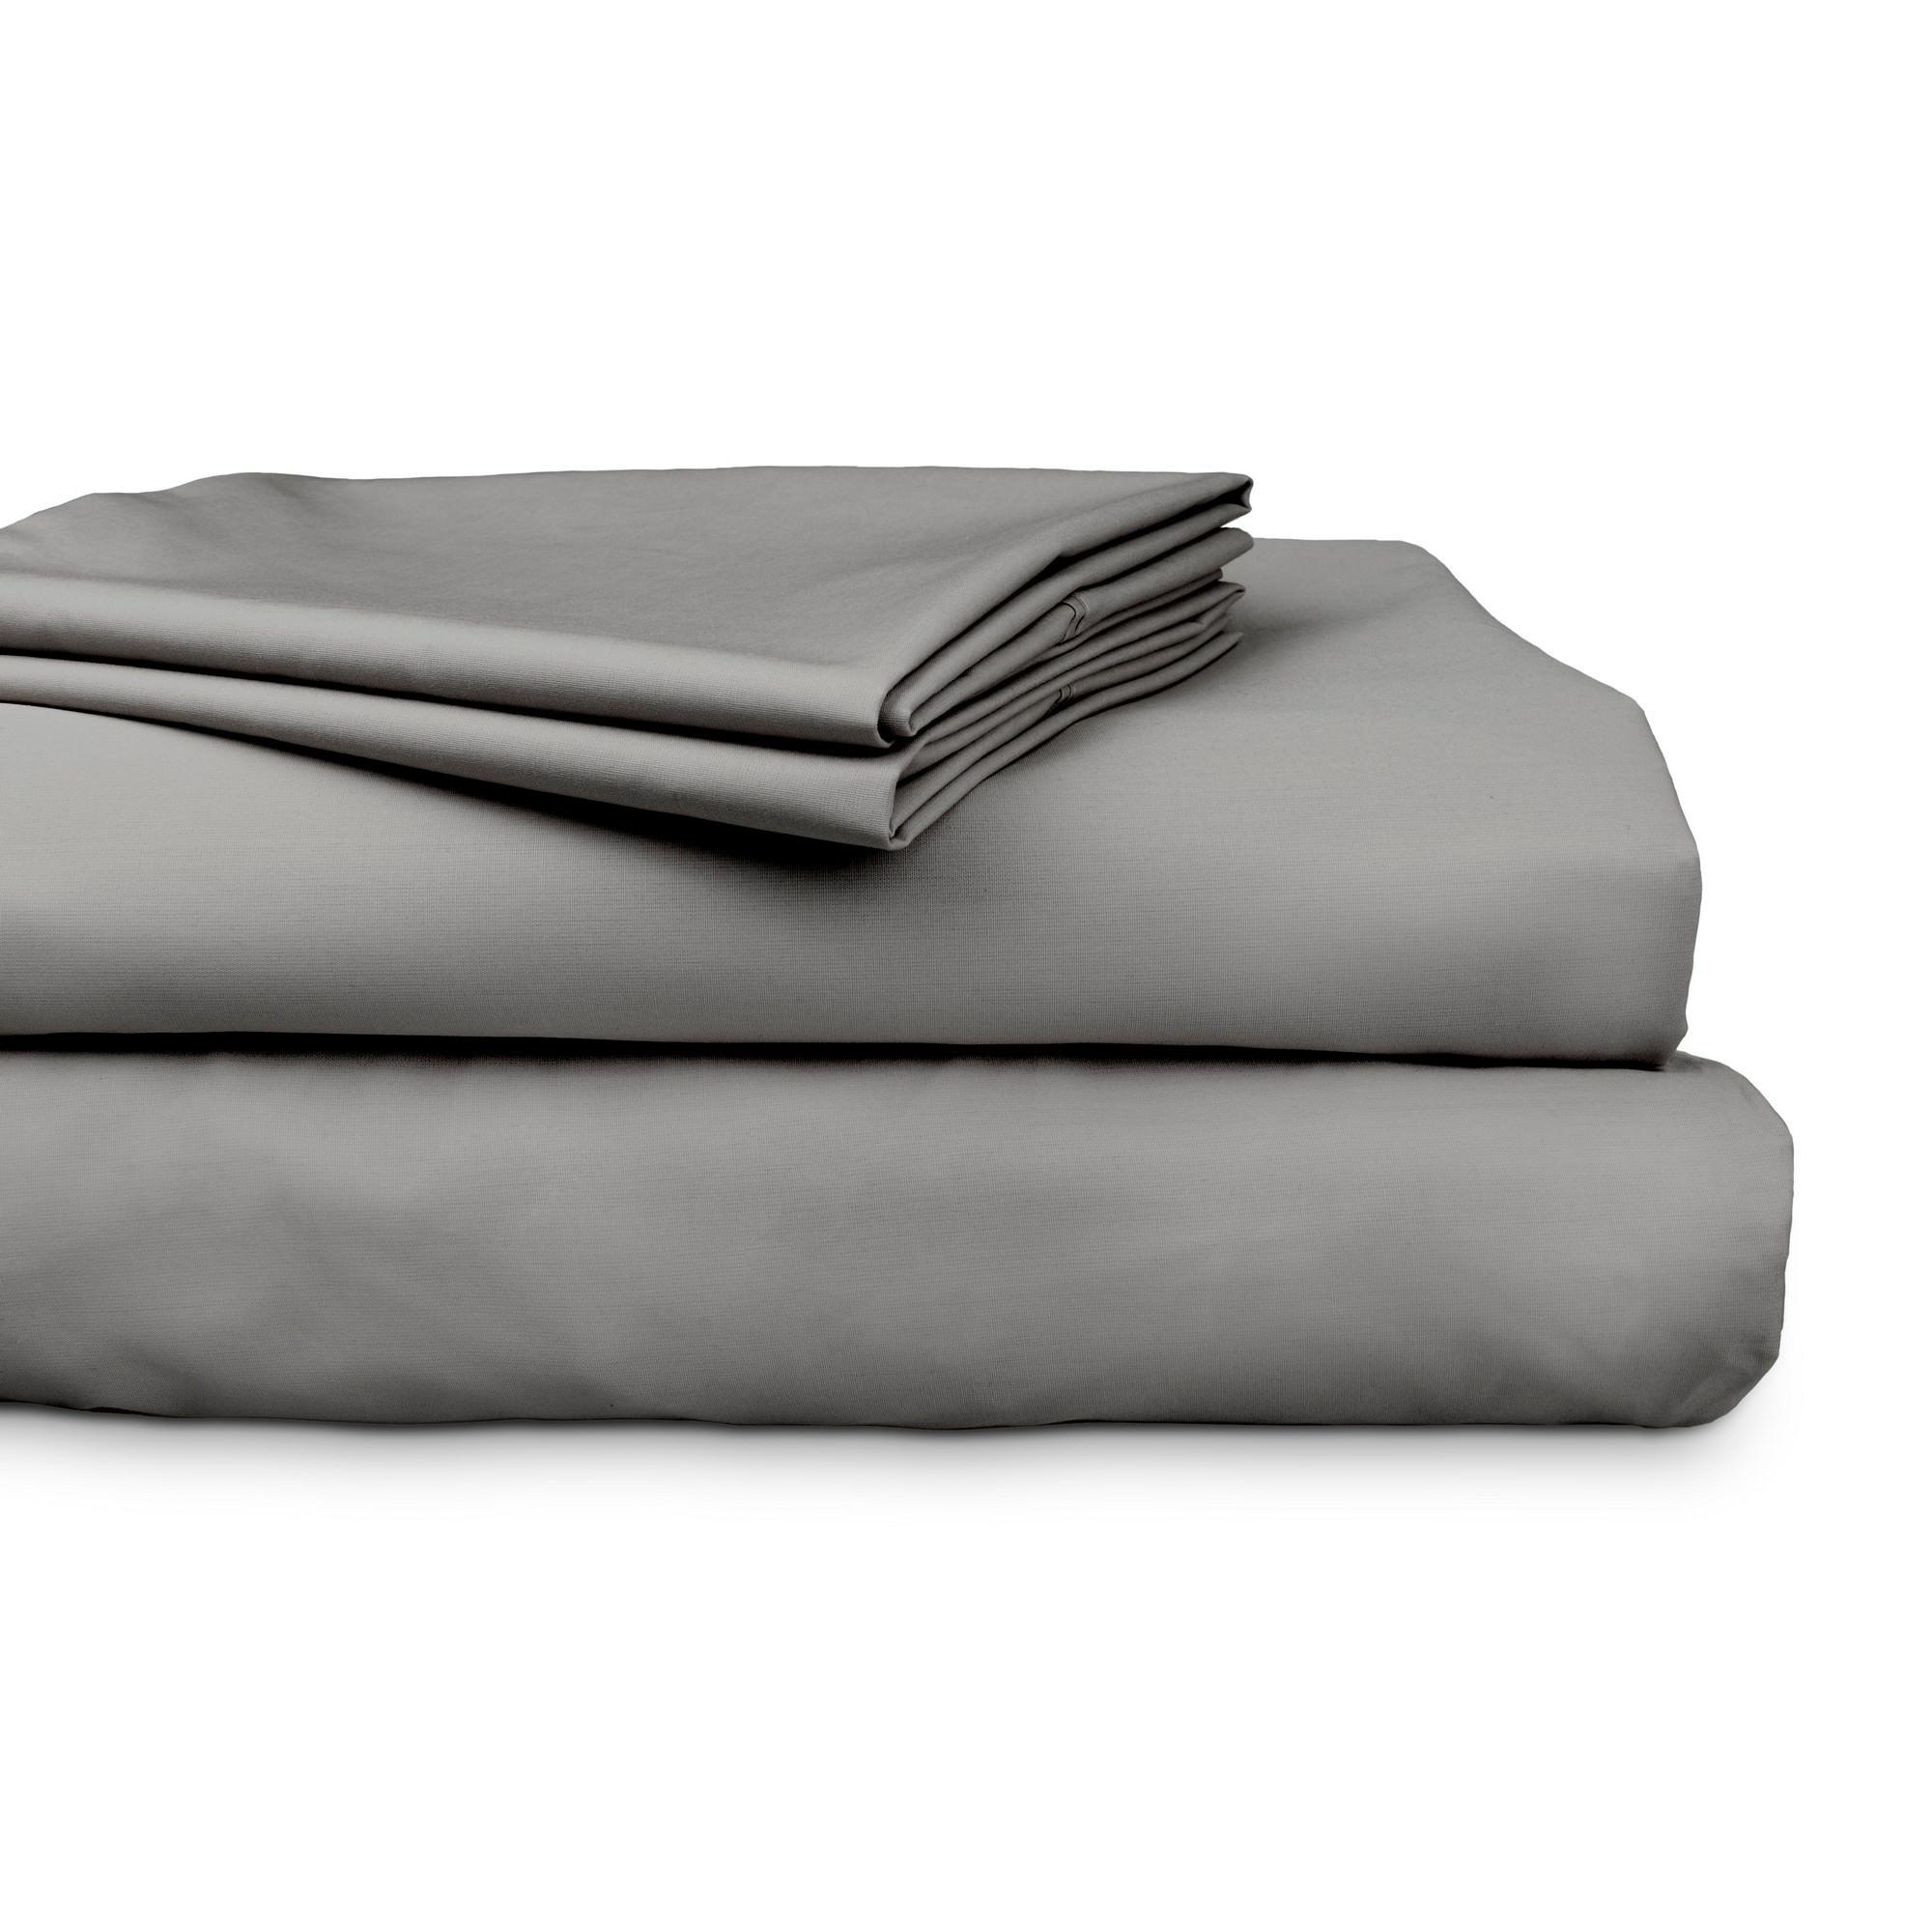 Ajee 4 Piece 300TC Cotton Sheet Set, Queen, Charcoal